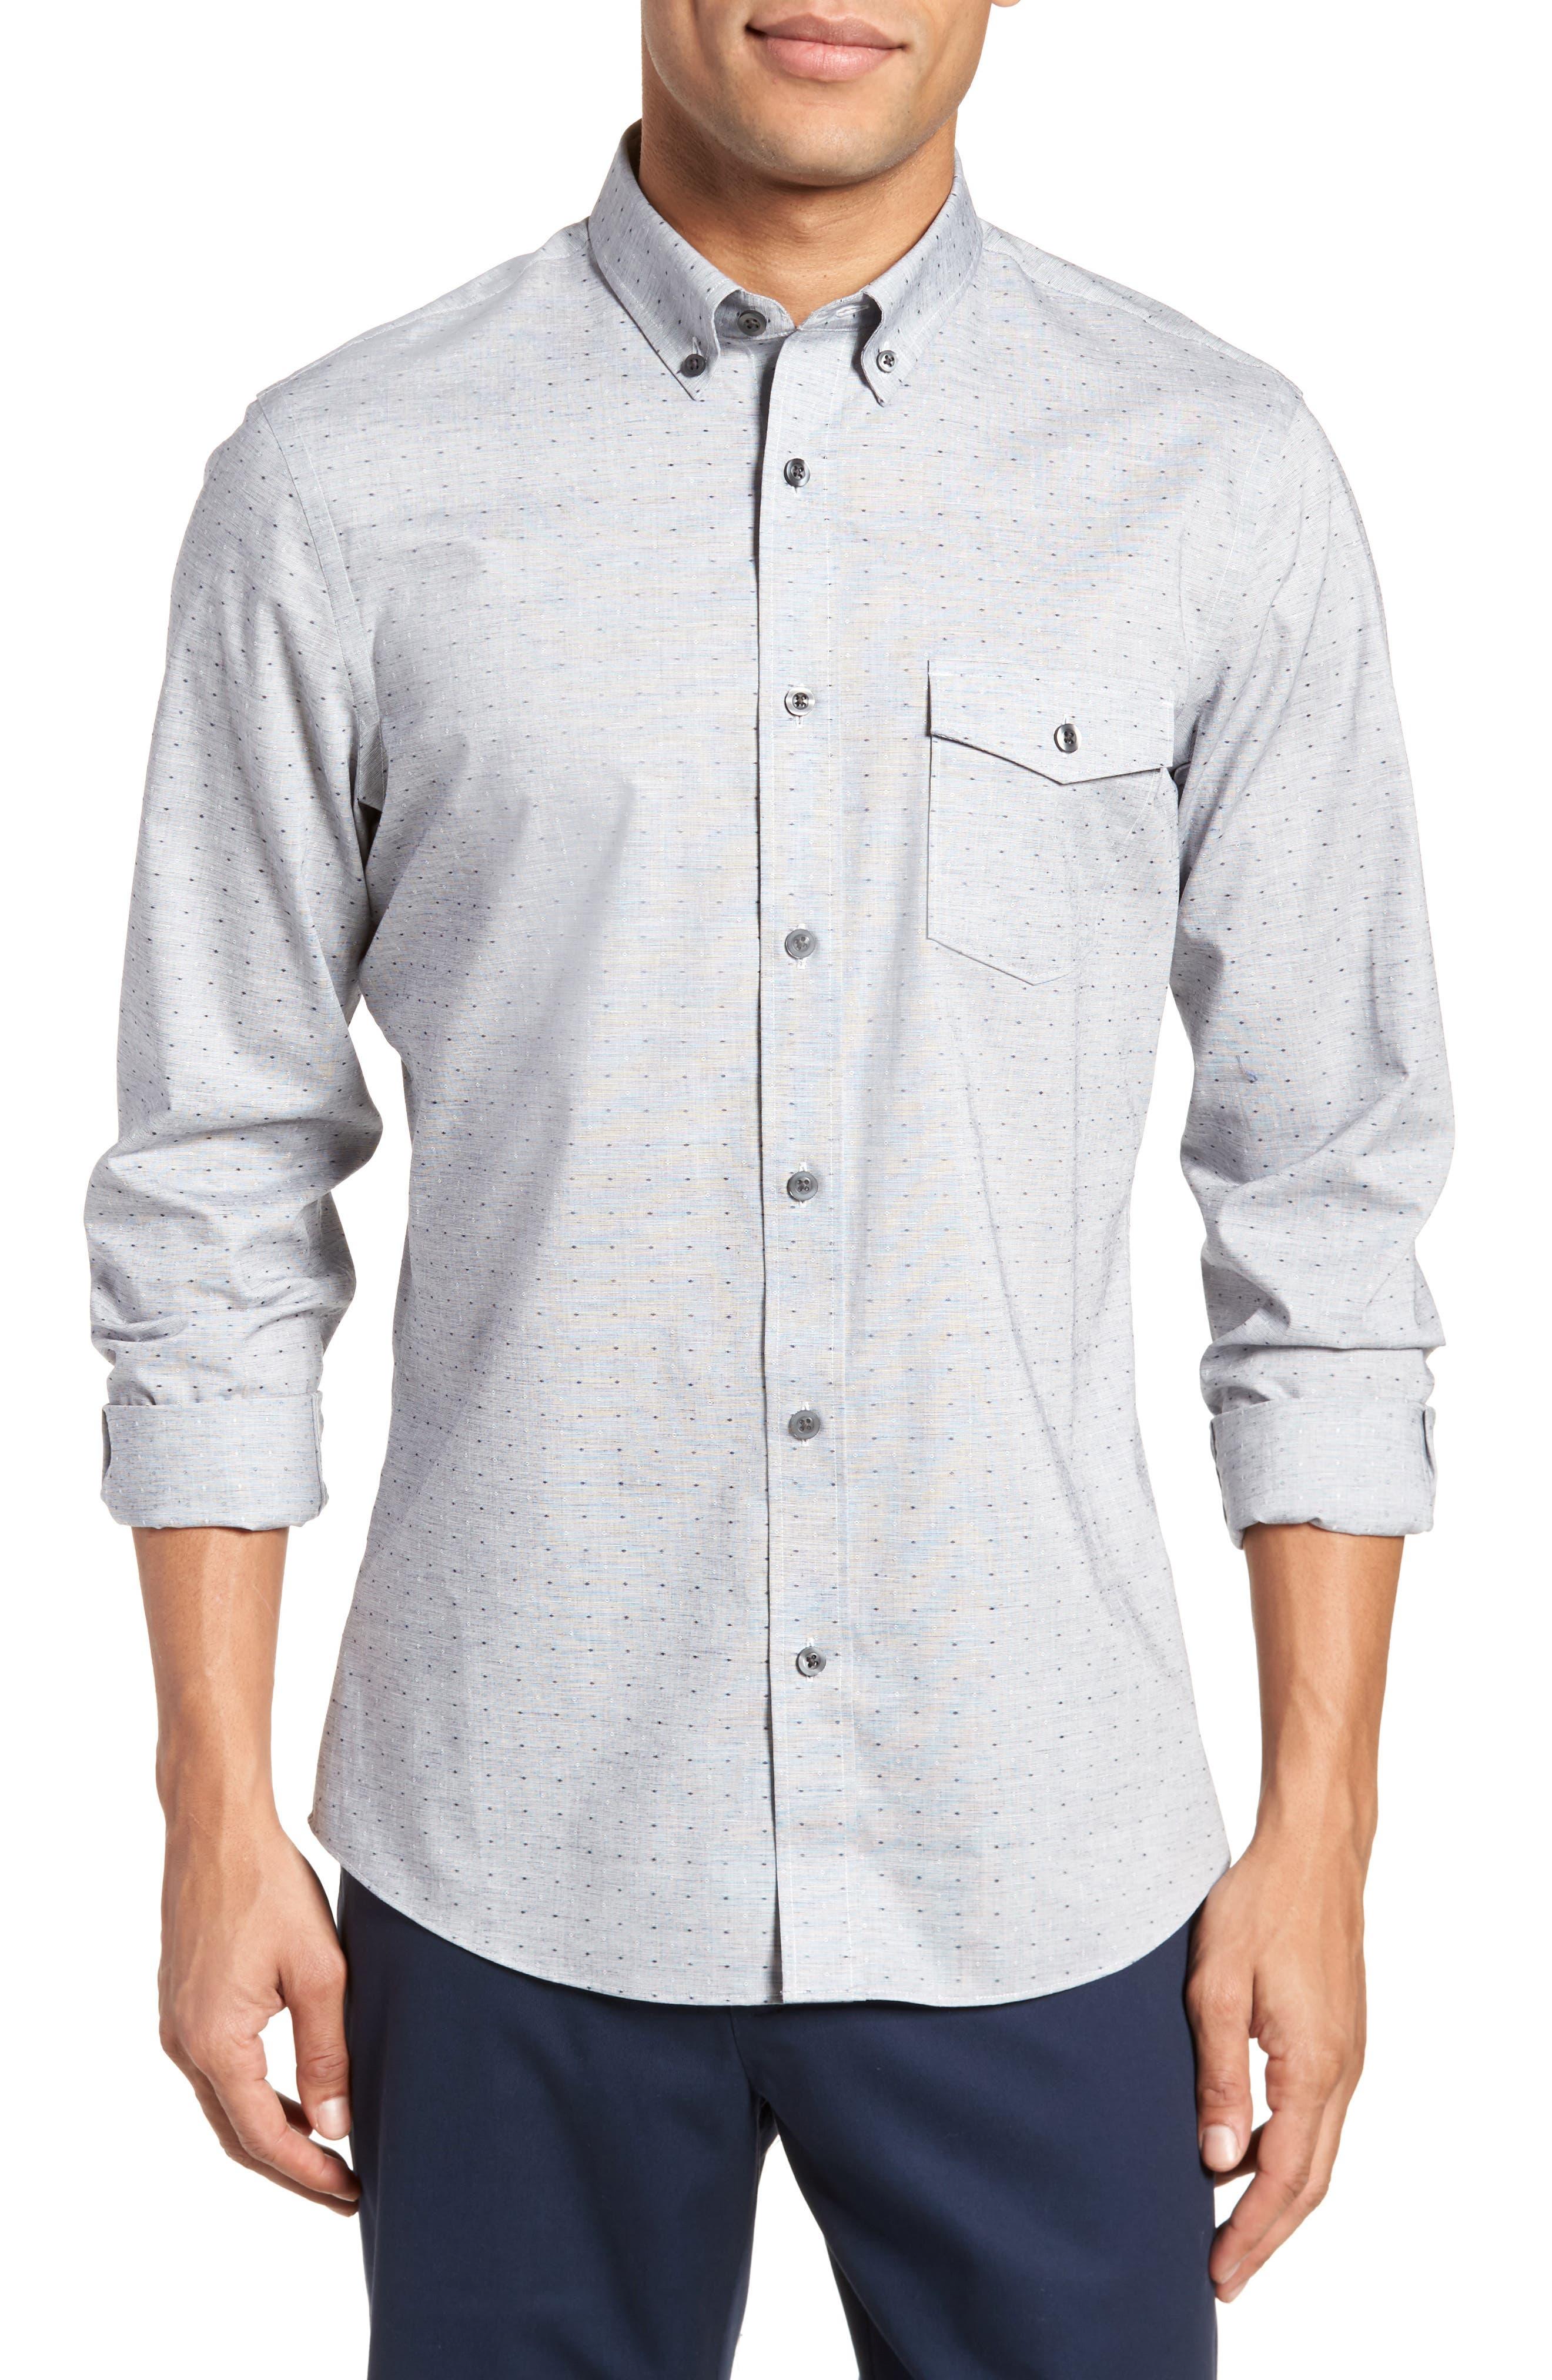 Trim Fit Dobby Sport Shirt,                             Main thumbnail 1, color,                             Navy White Eoe Dobby